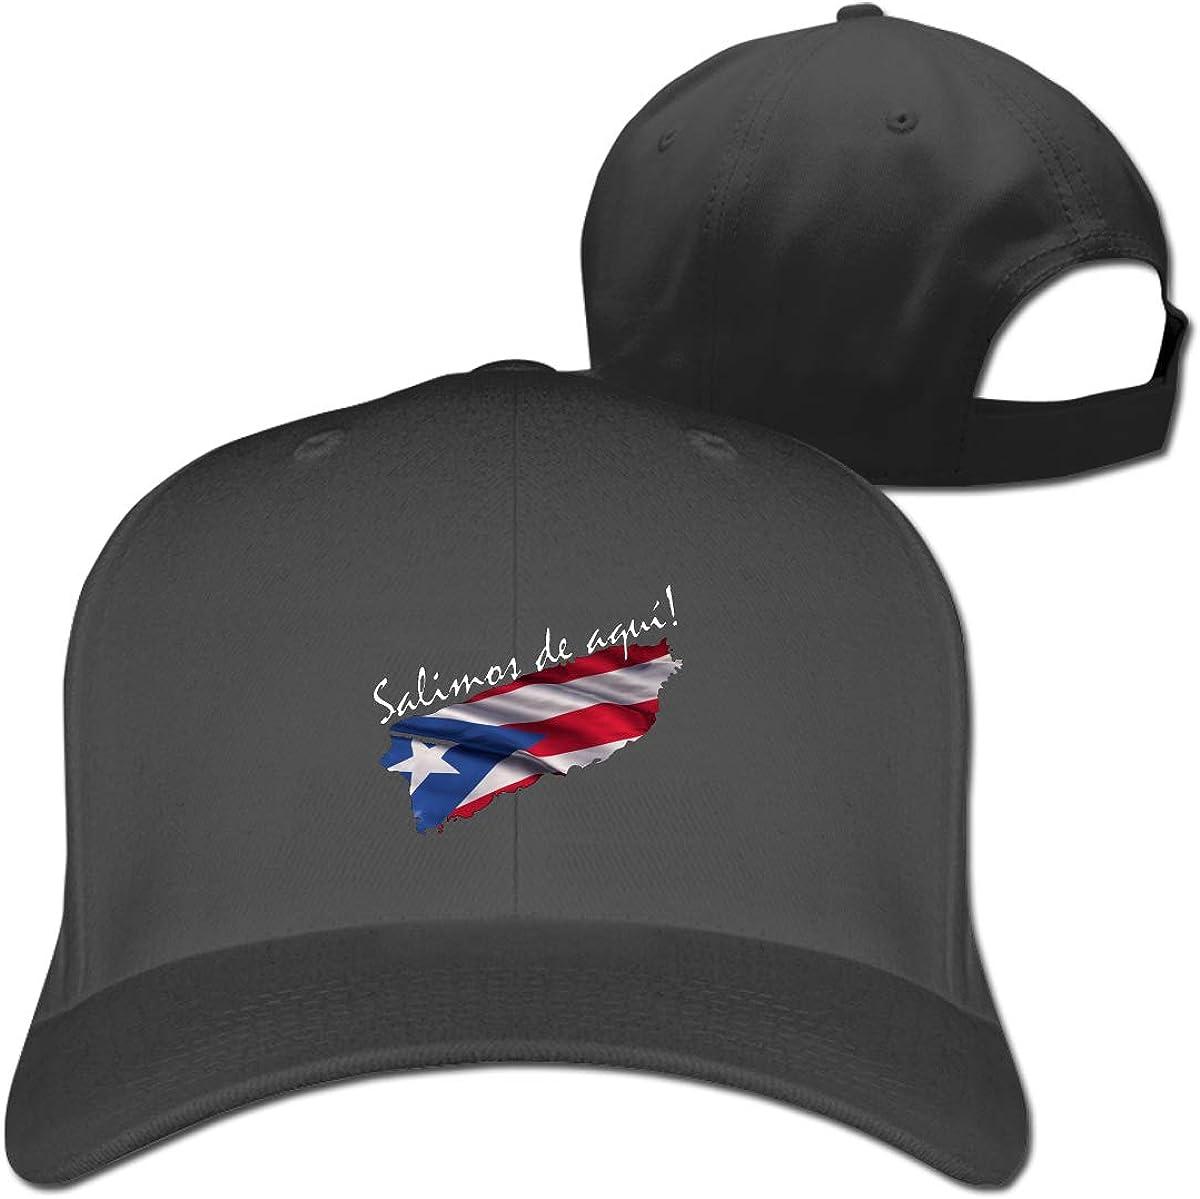 Salimos De Aqu铆 Fashion Adjustable Cotton Baseball Caps Trucker Driver Hat Outdoor Cap Black